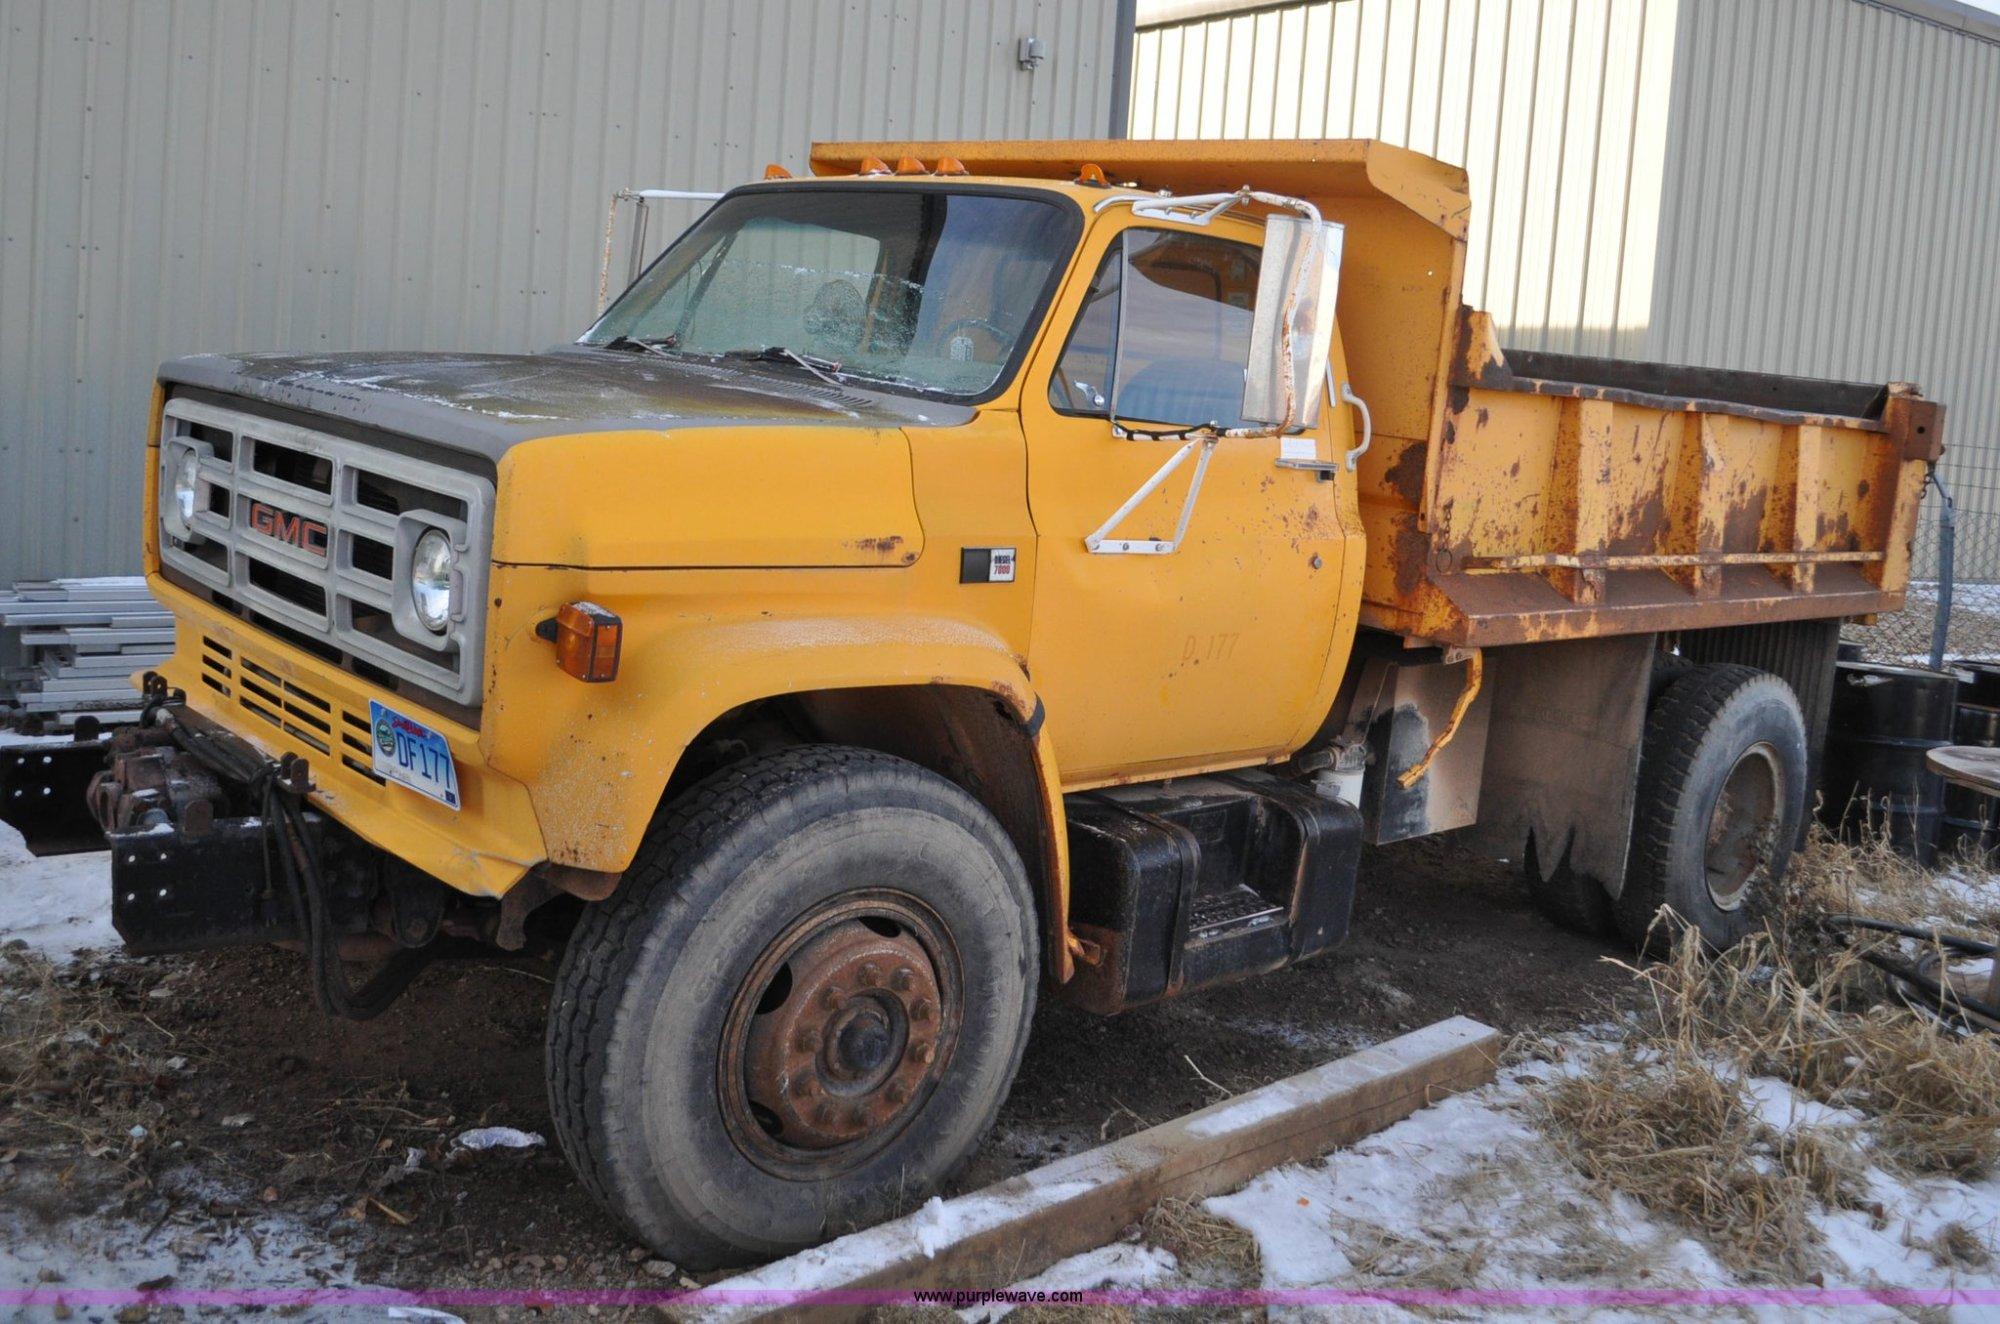 hight resolution of f2161 image for item f2161 1985 gmc topkick 7000 dump truck